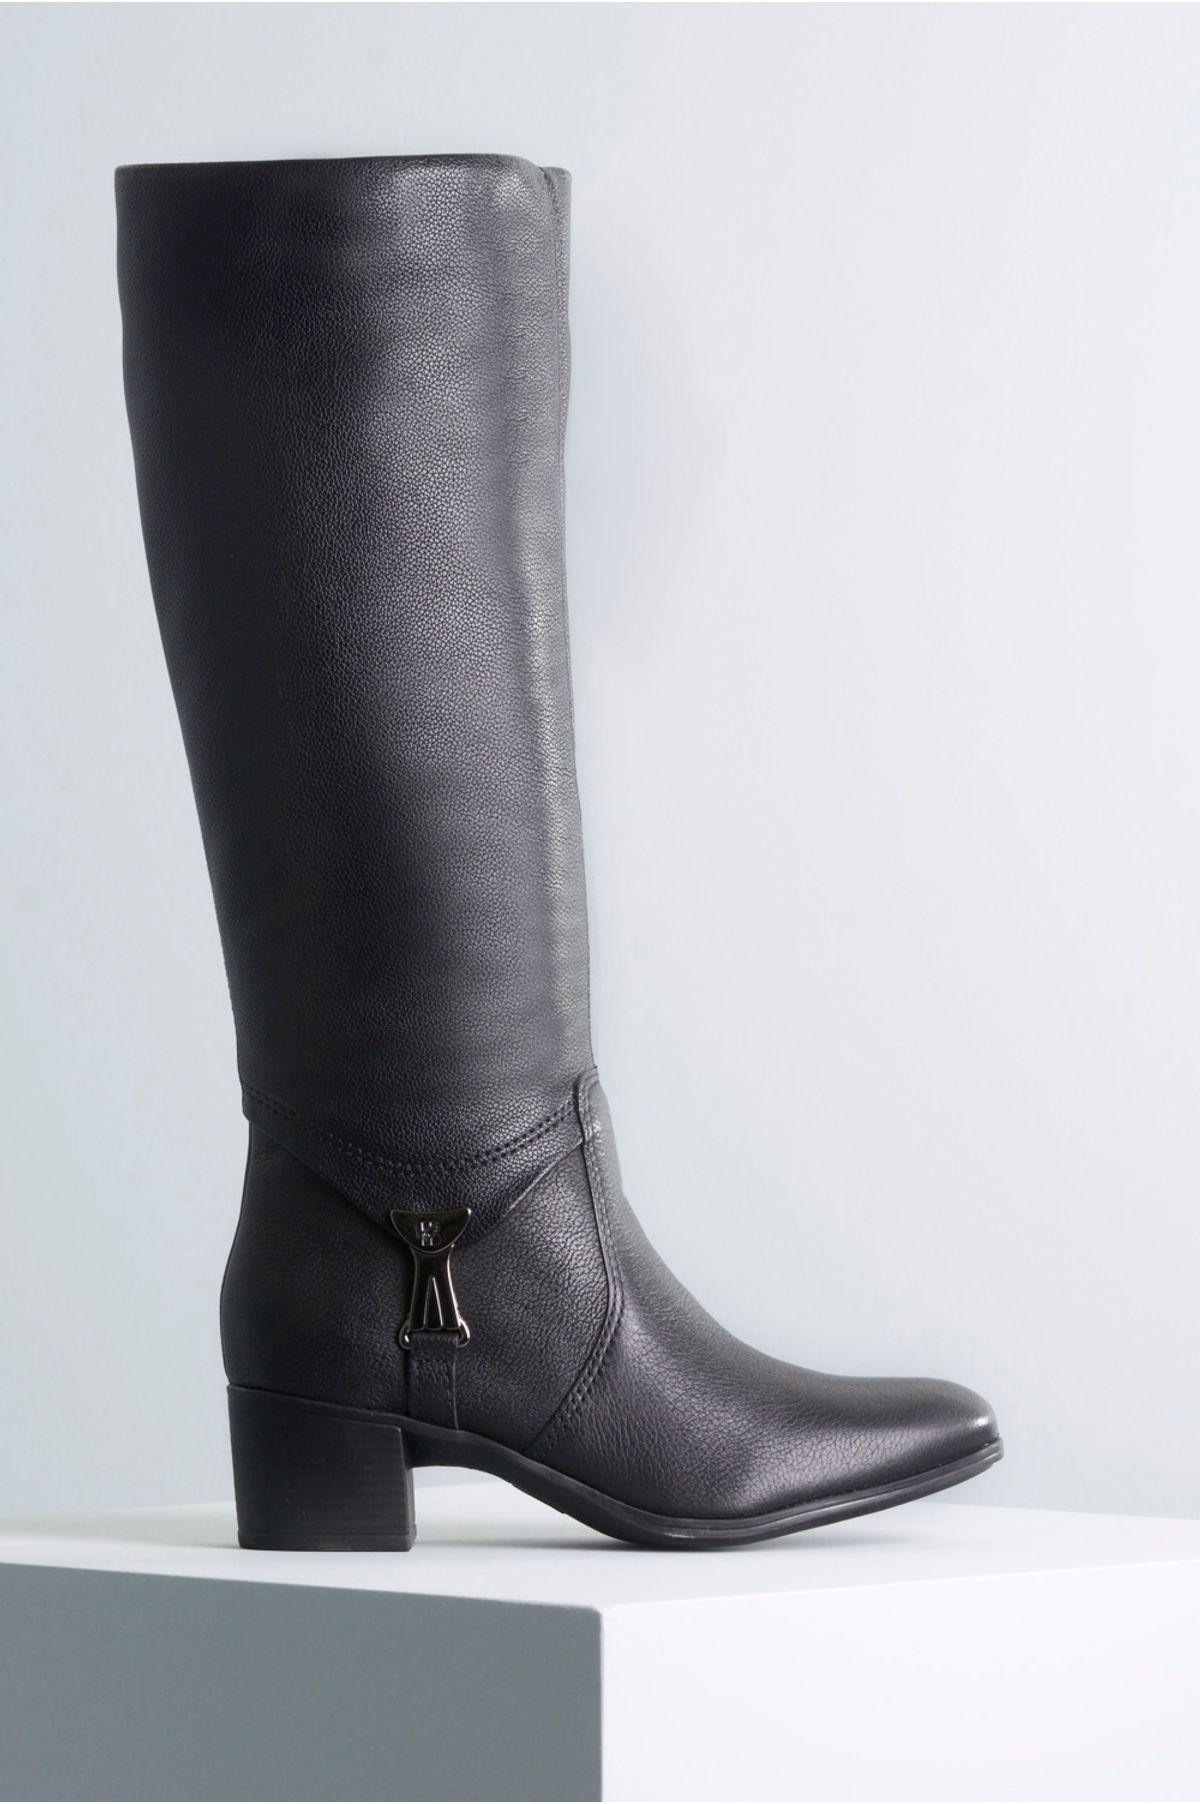 39bdf11709 Bota Feminina Salto Médio Mileidy Bottero CR-PRETO - Mundial Calçados